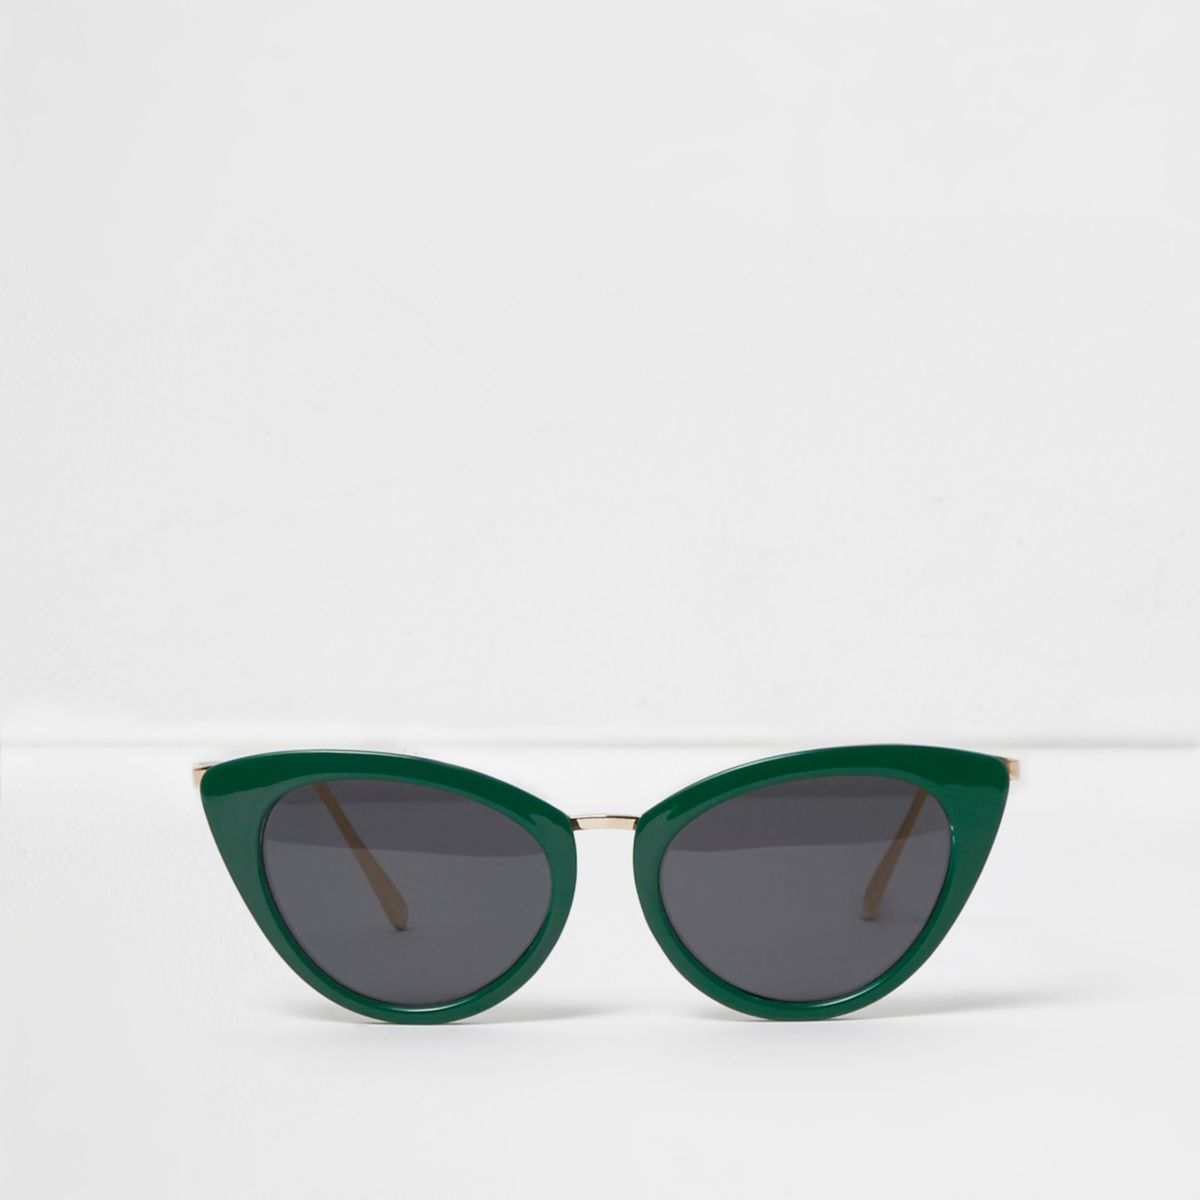 Green cat eye smoke lens sunglasses